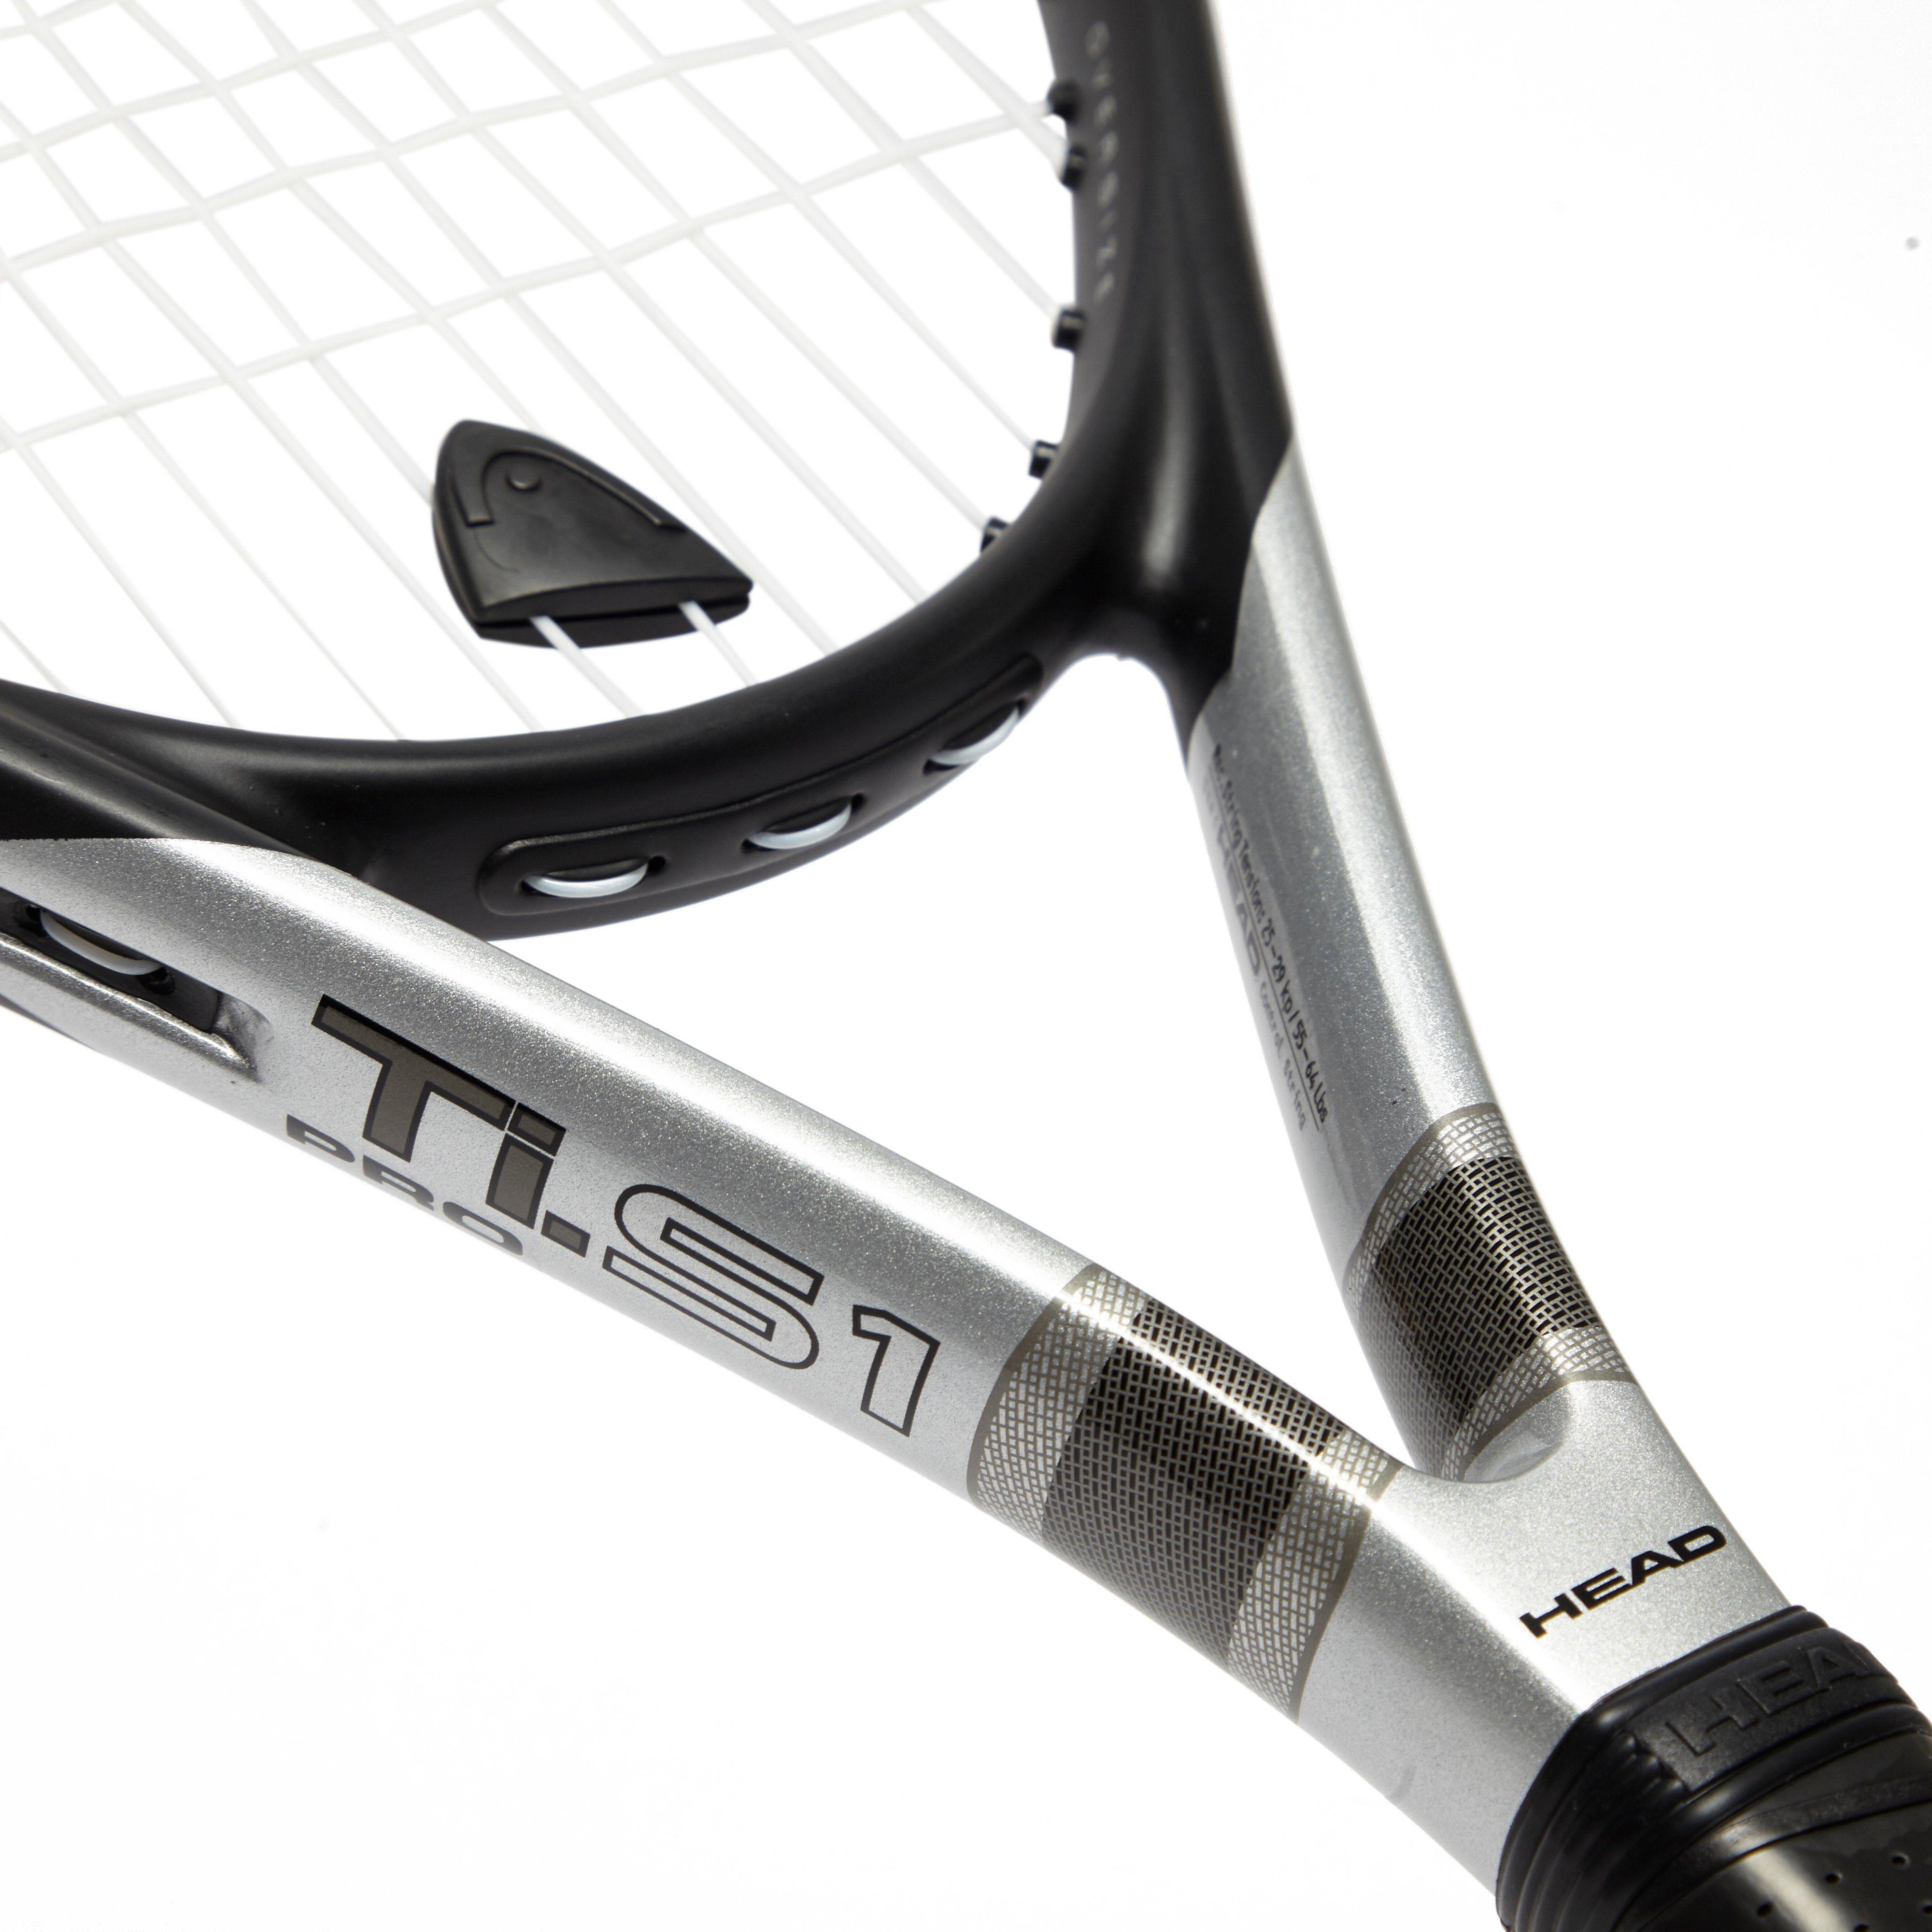 Texline TI.S1 Pro Tennis Racket